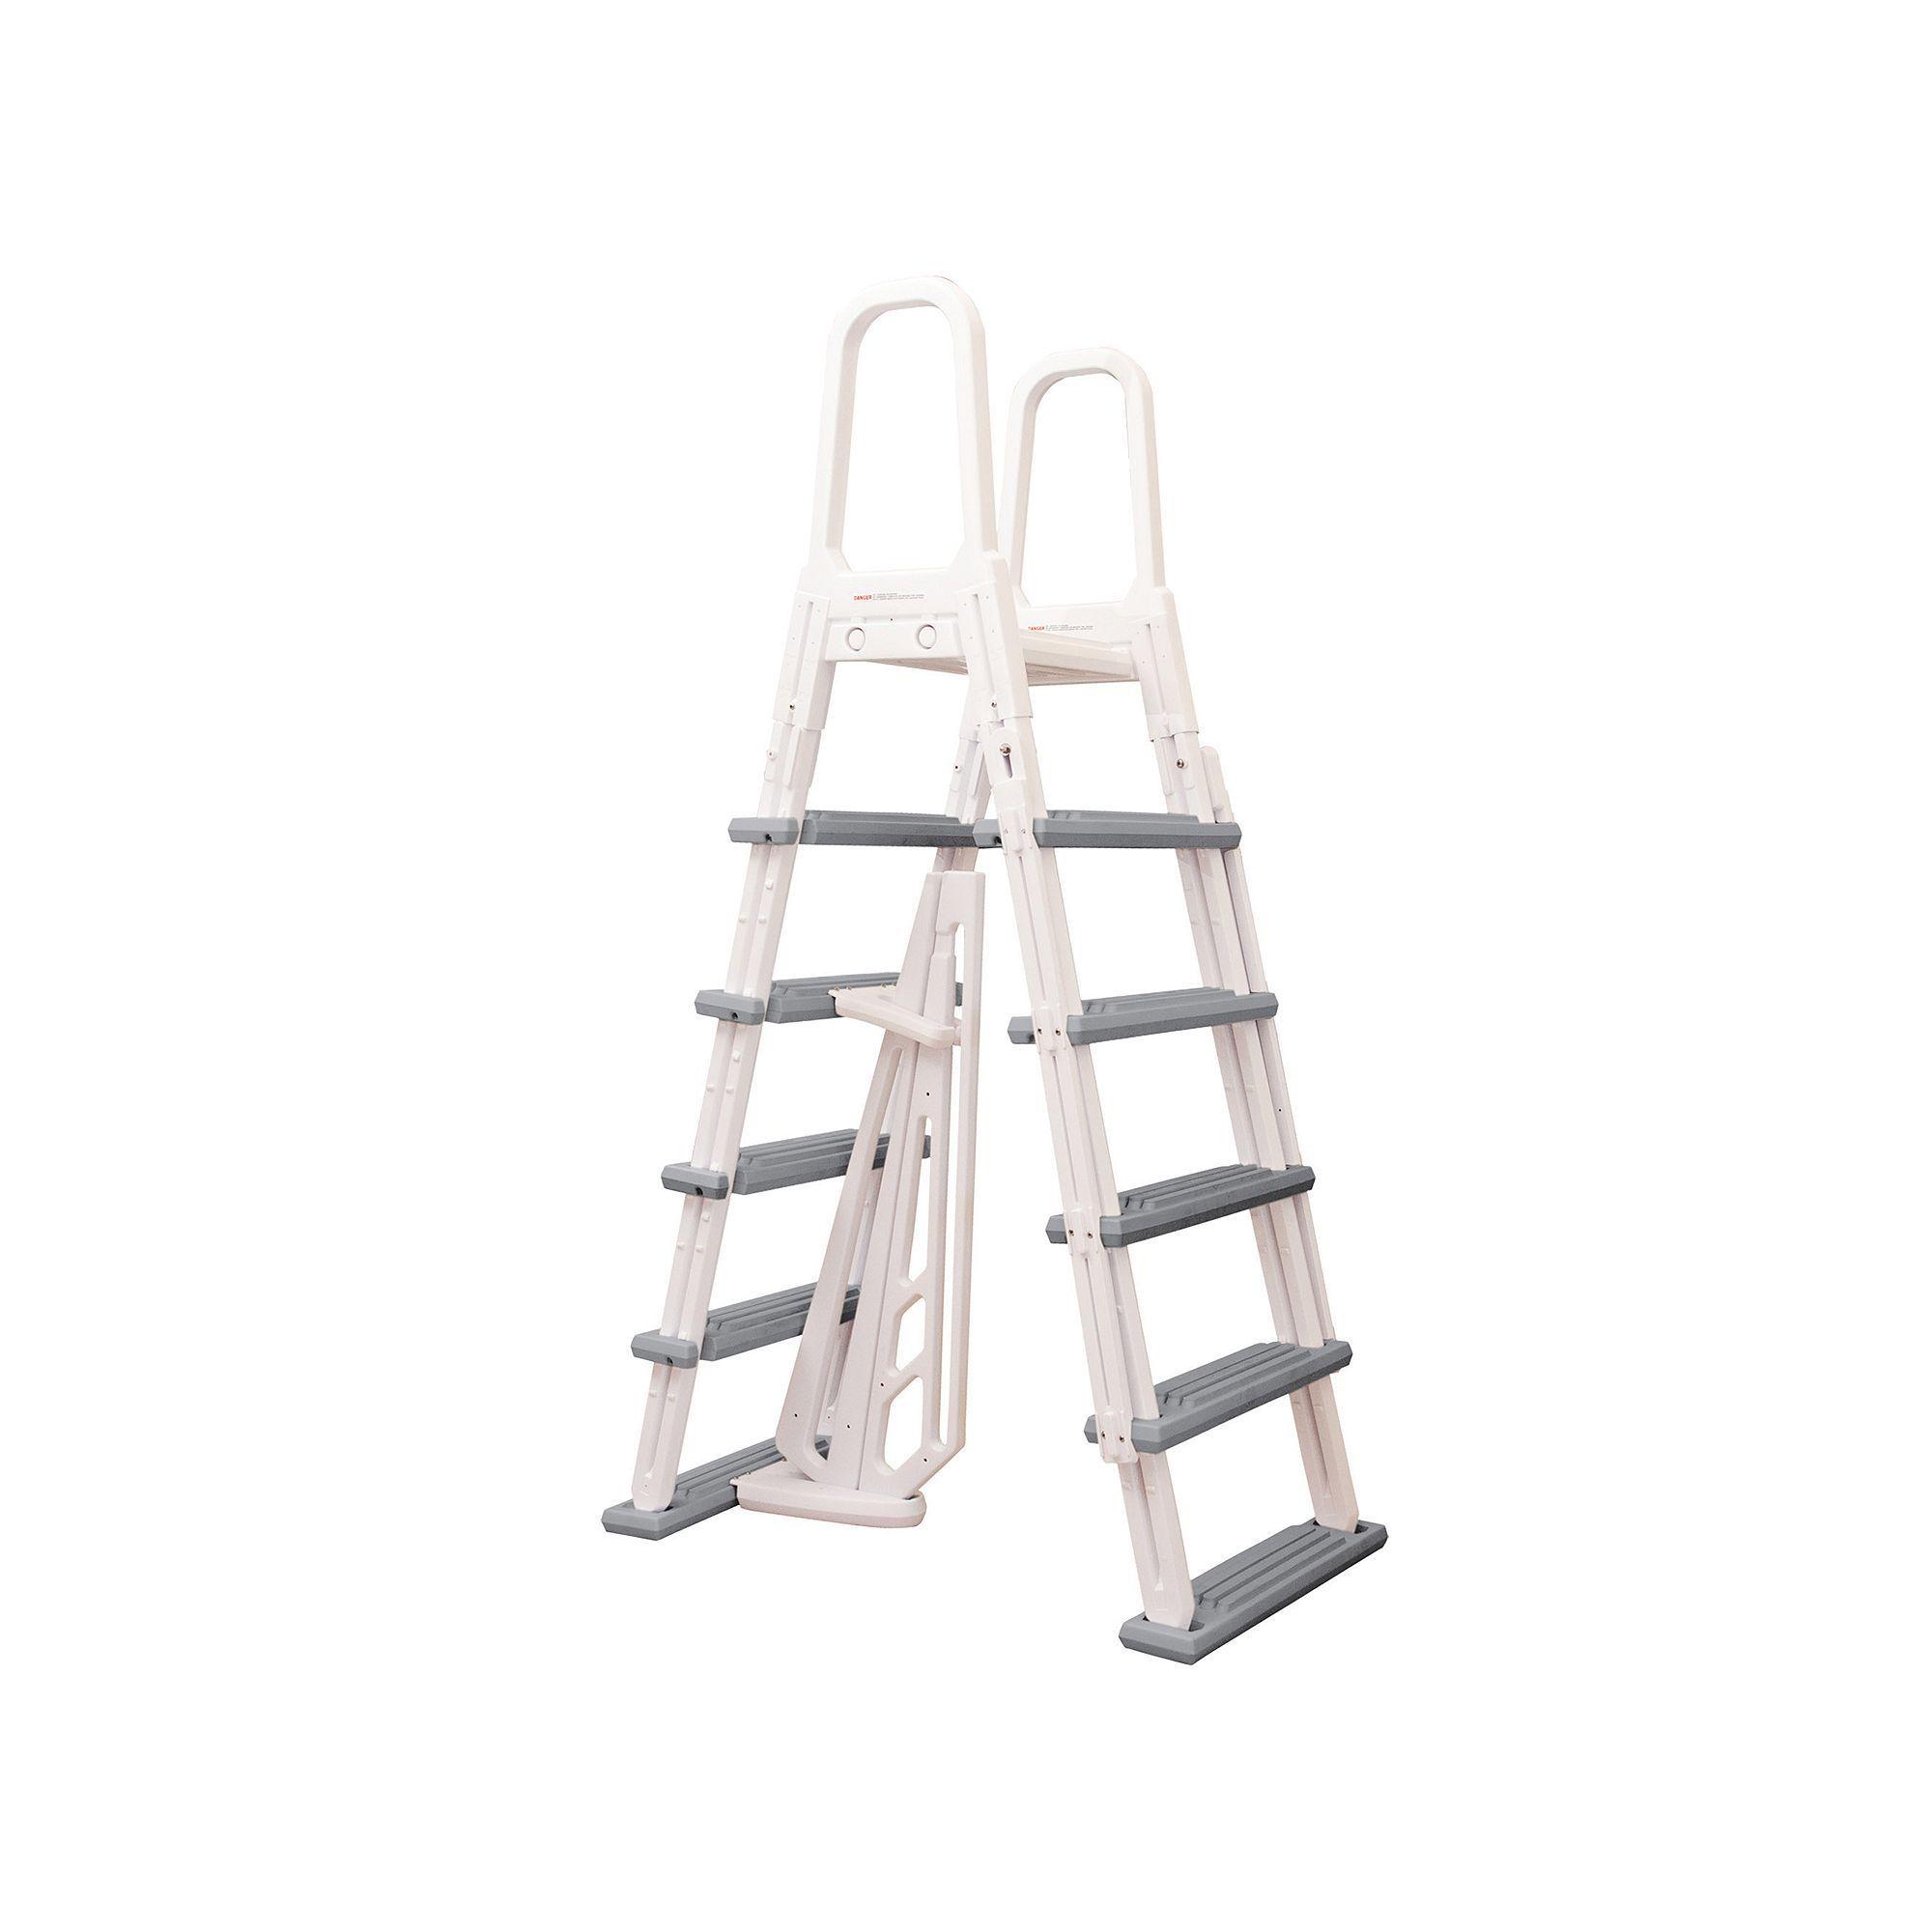 Blue Wave Heavy Duty AFrame Ladder for AboveGround Pools